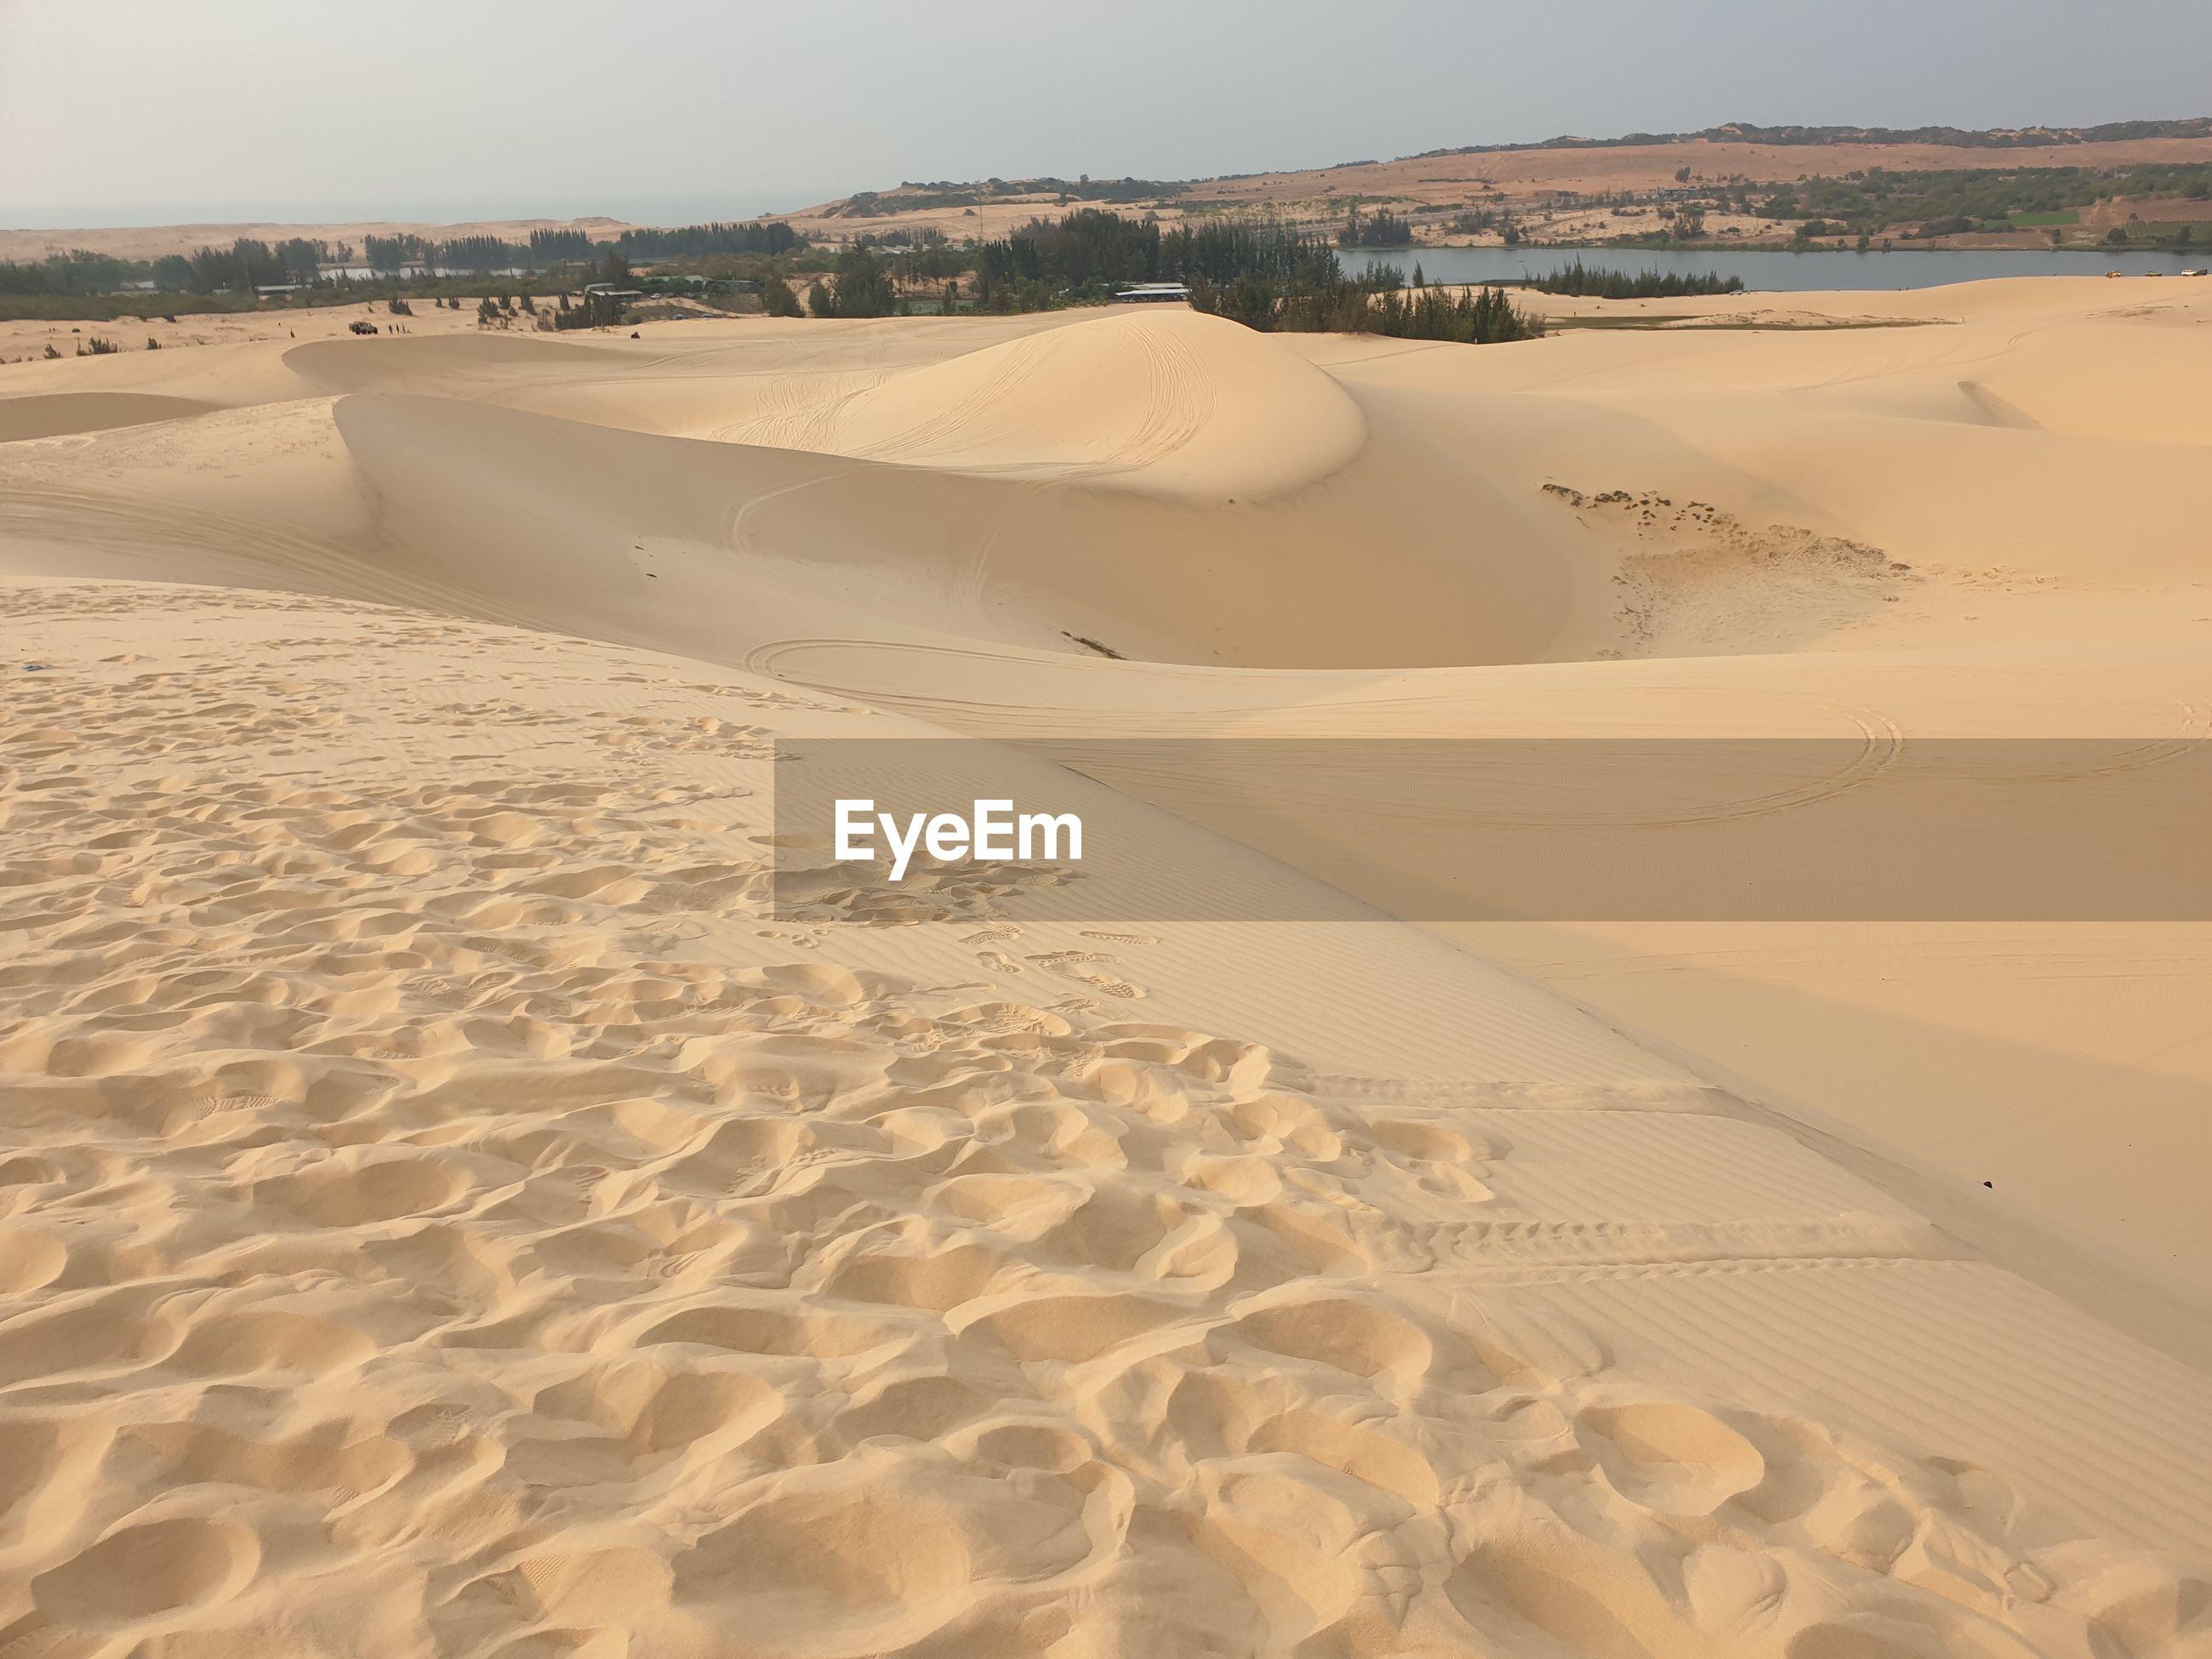 SCENIC VIEW OF SAND DUNE ON BEACH